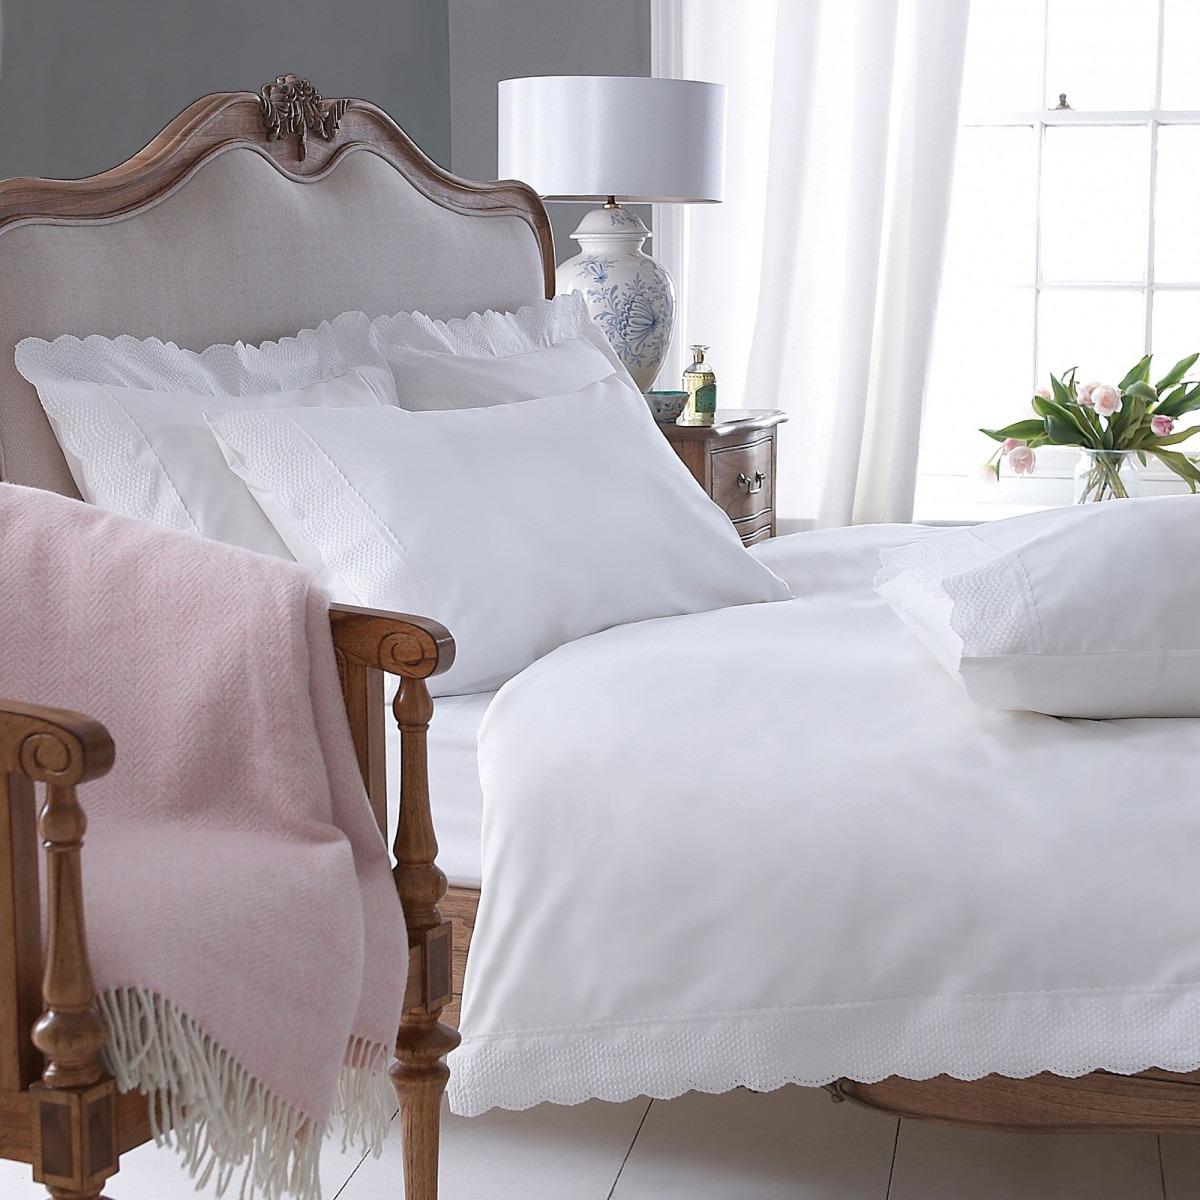 Mariette Bed Linen